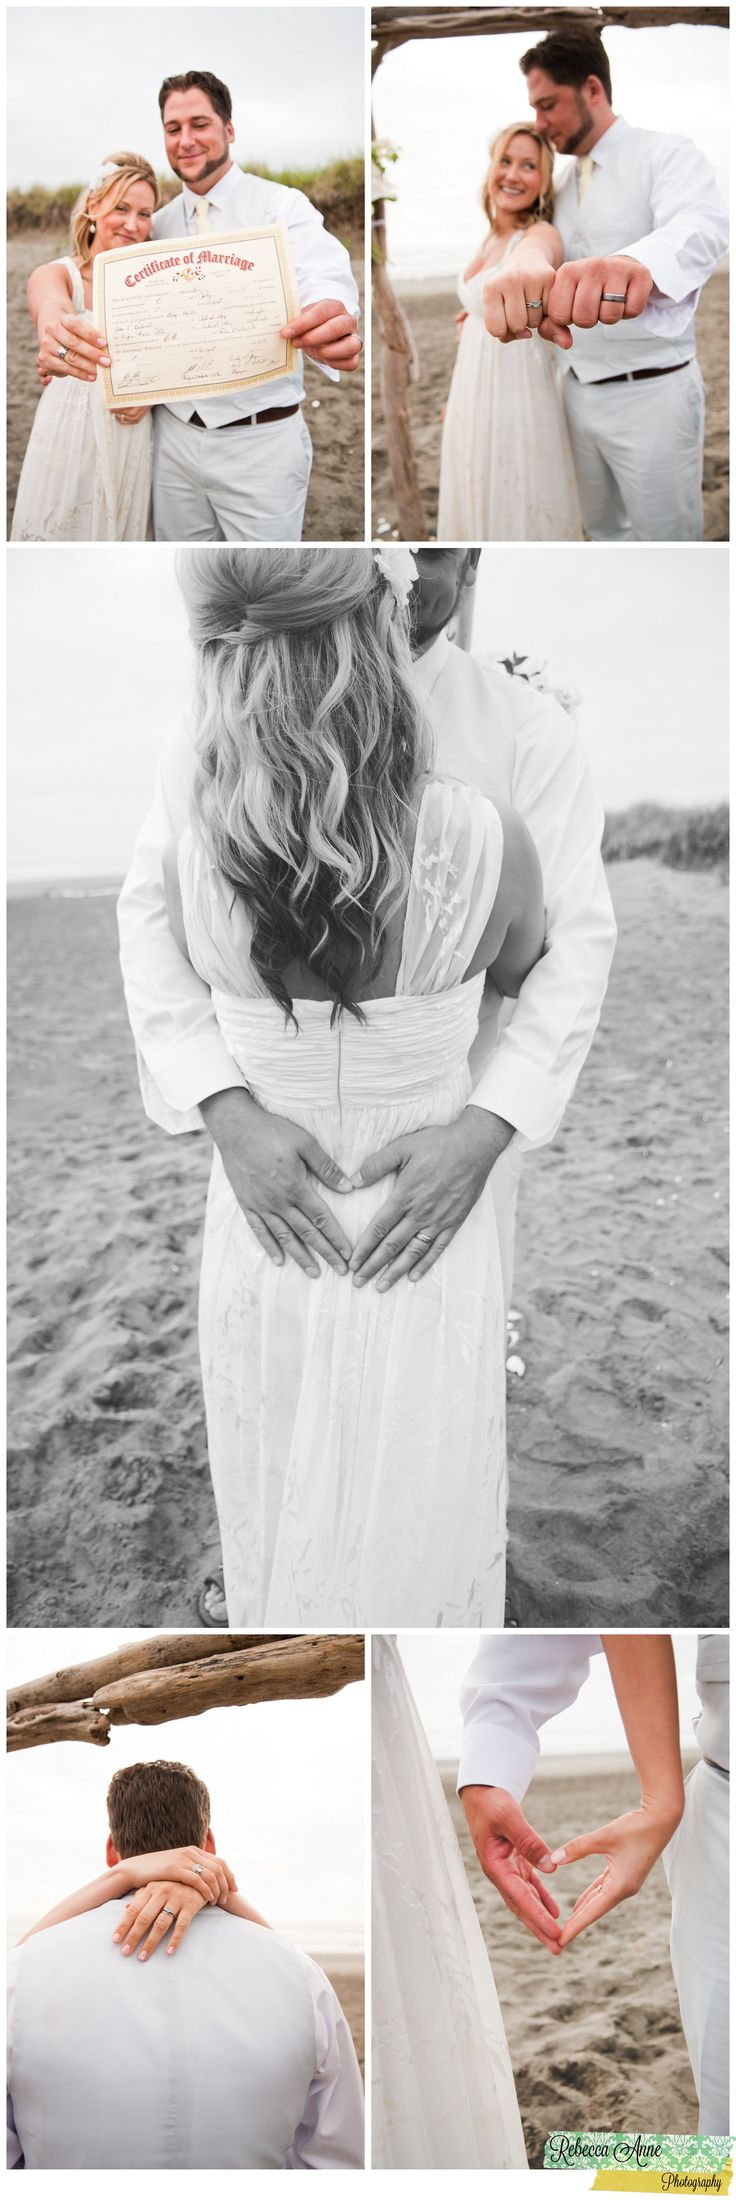 Bride & Groom | Wedding | Seattle, WA Photographer | Ocean Shores| Westhaven Beach Park | Rebecca Anne photography #Wedding #Pictures # Ring #Details #Beach #Beachwedding